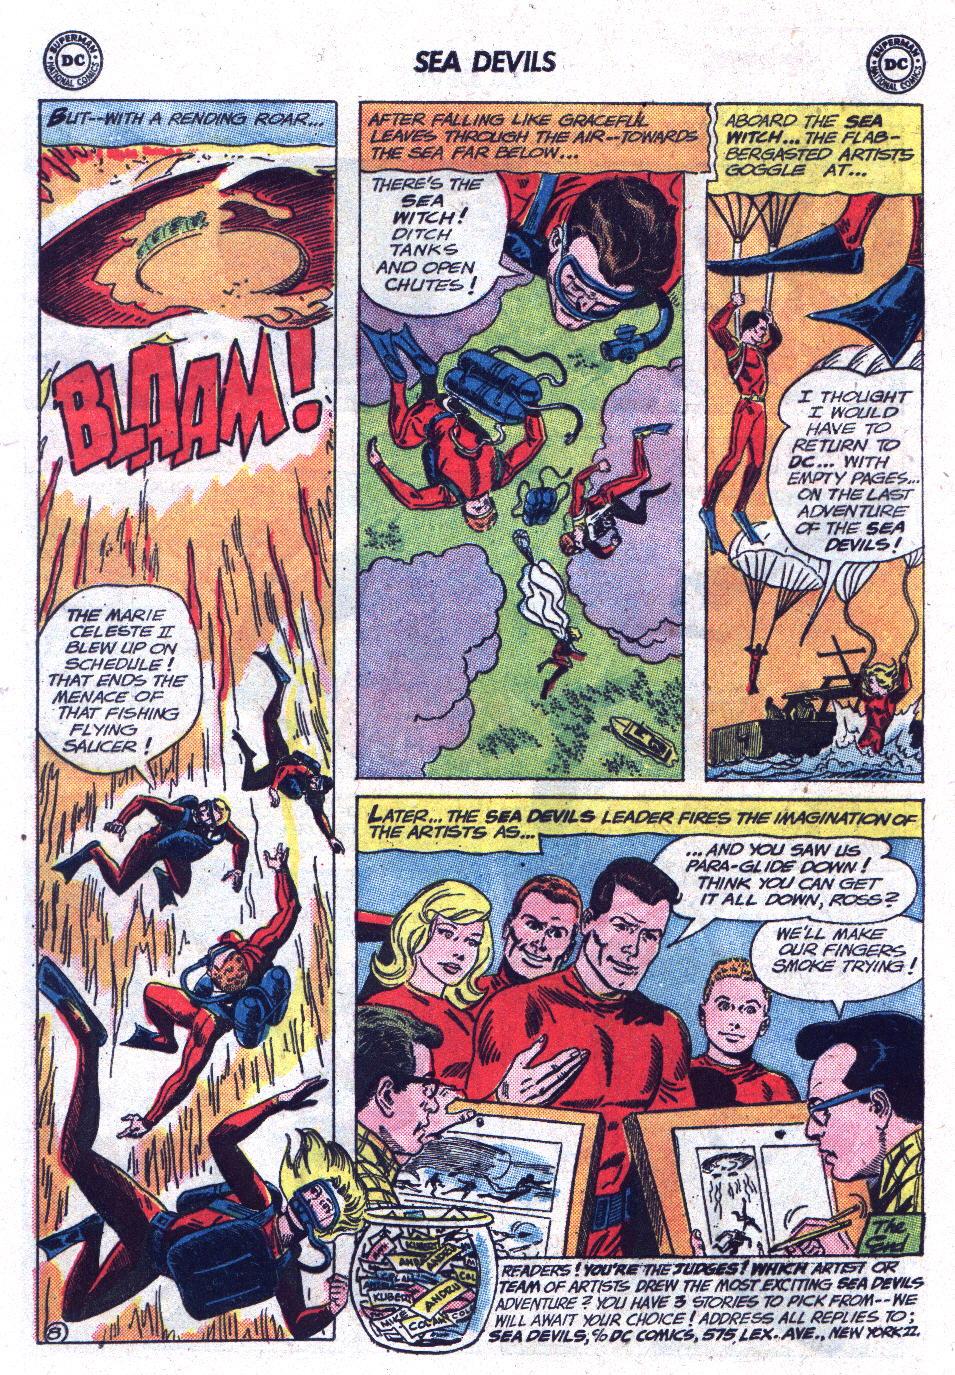 Read online Sea Devils comic -  Issue #13 - 32